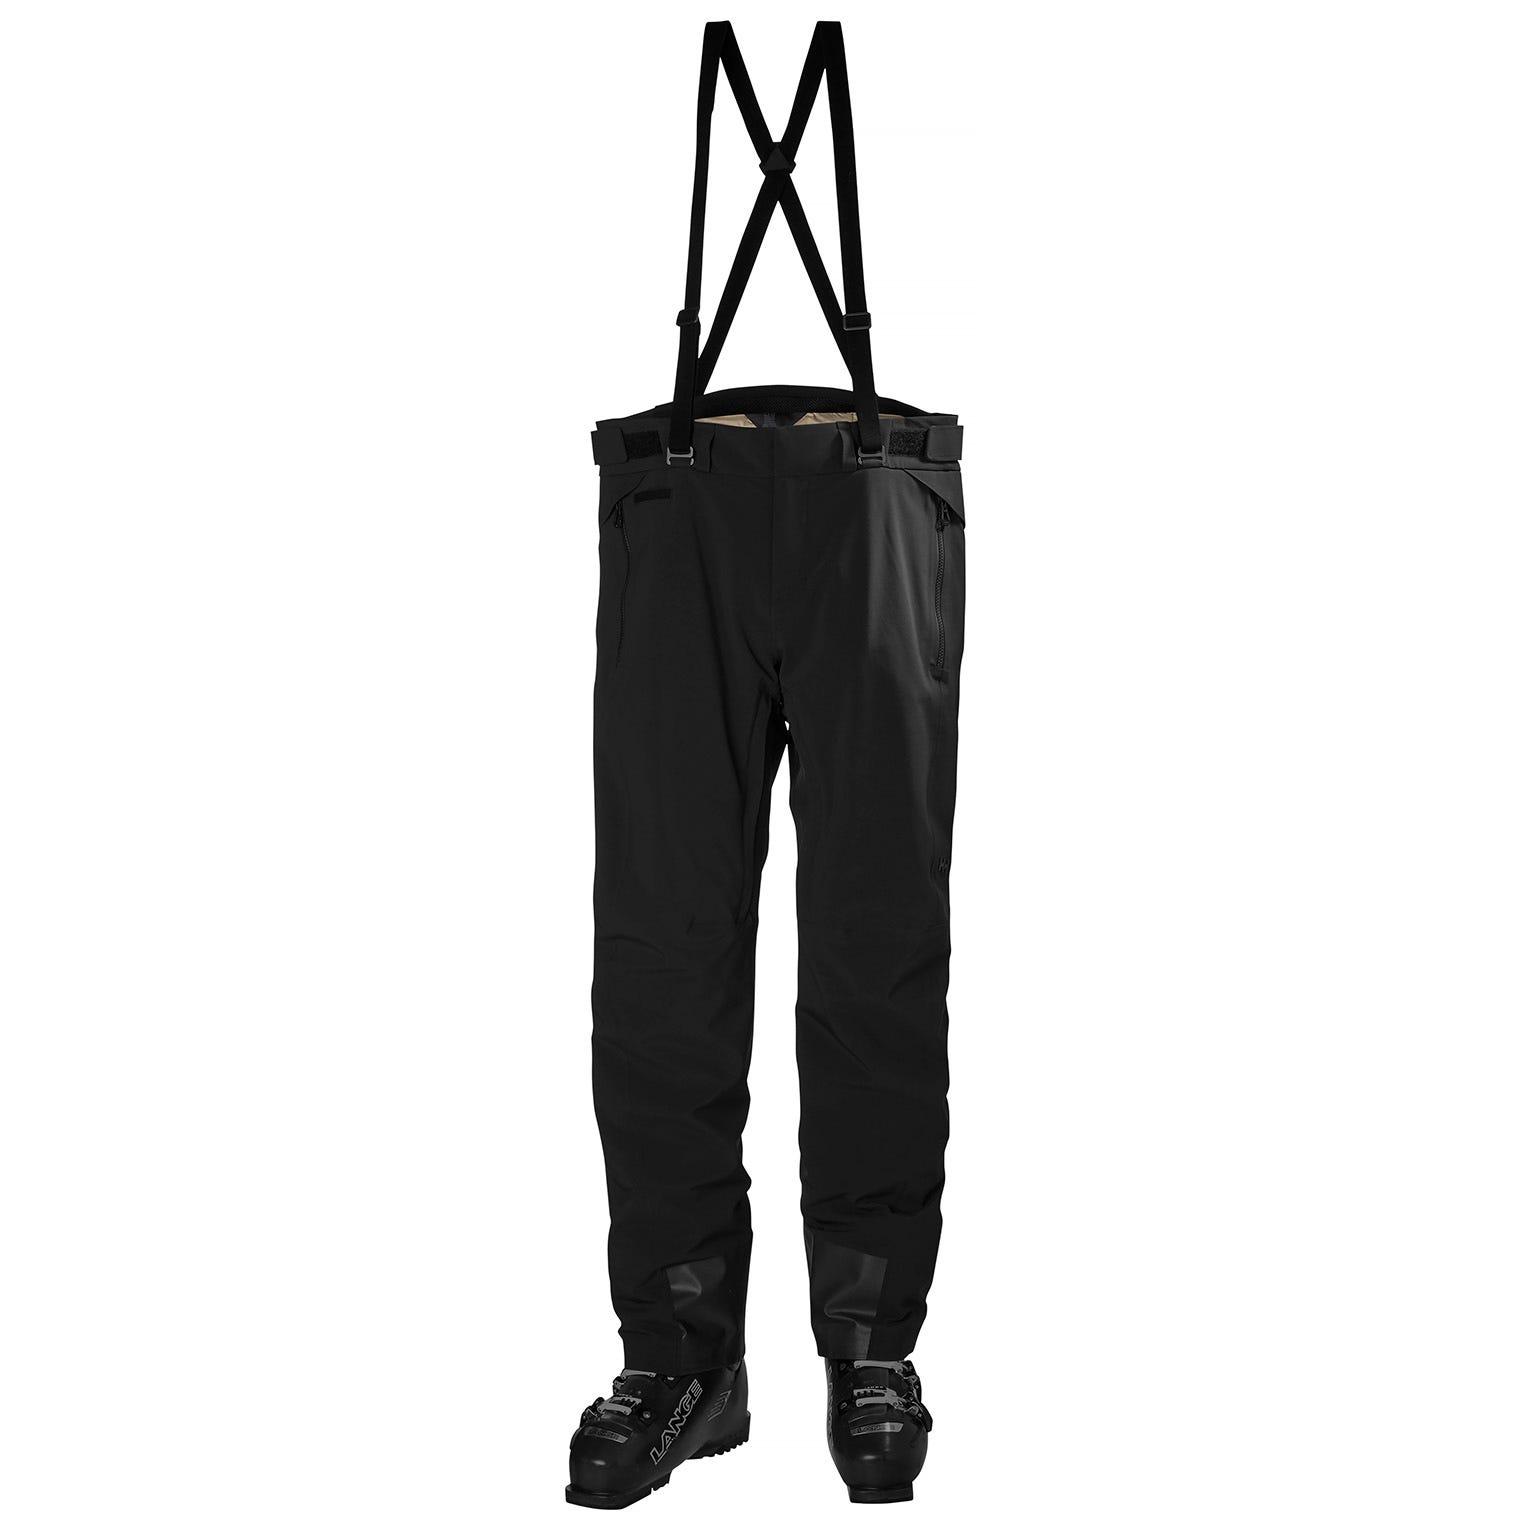 Helly Hansen Icon 2.0 Pant Mens Black L